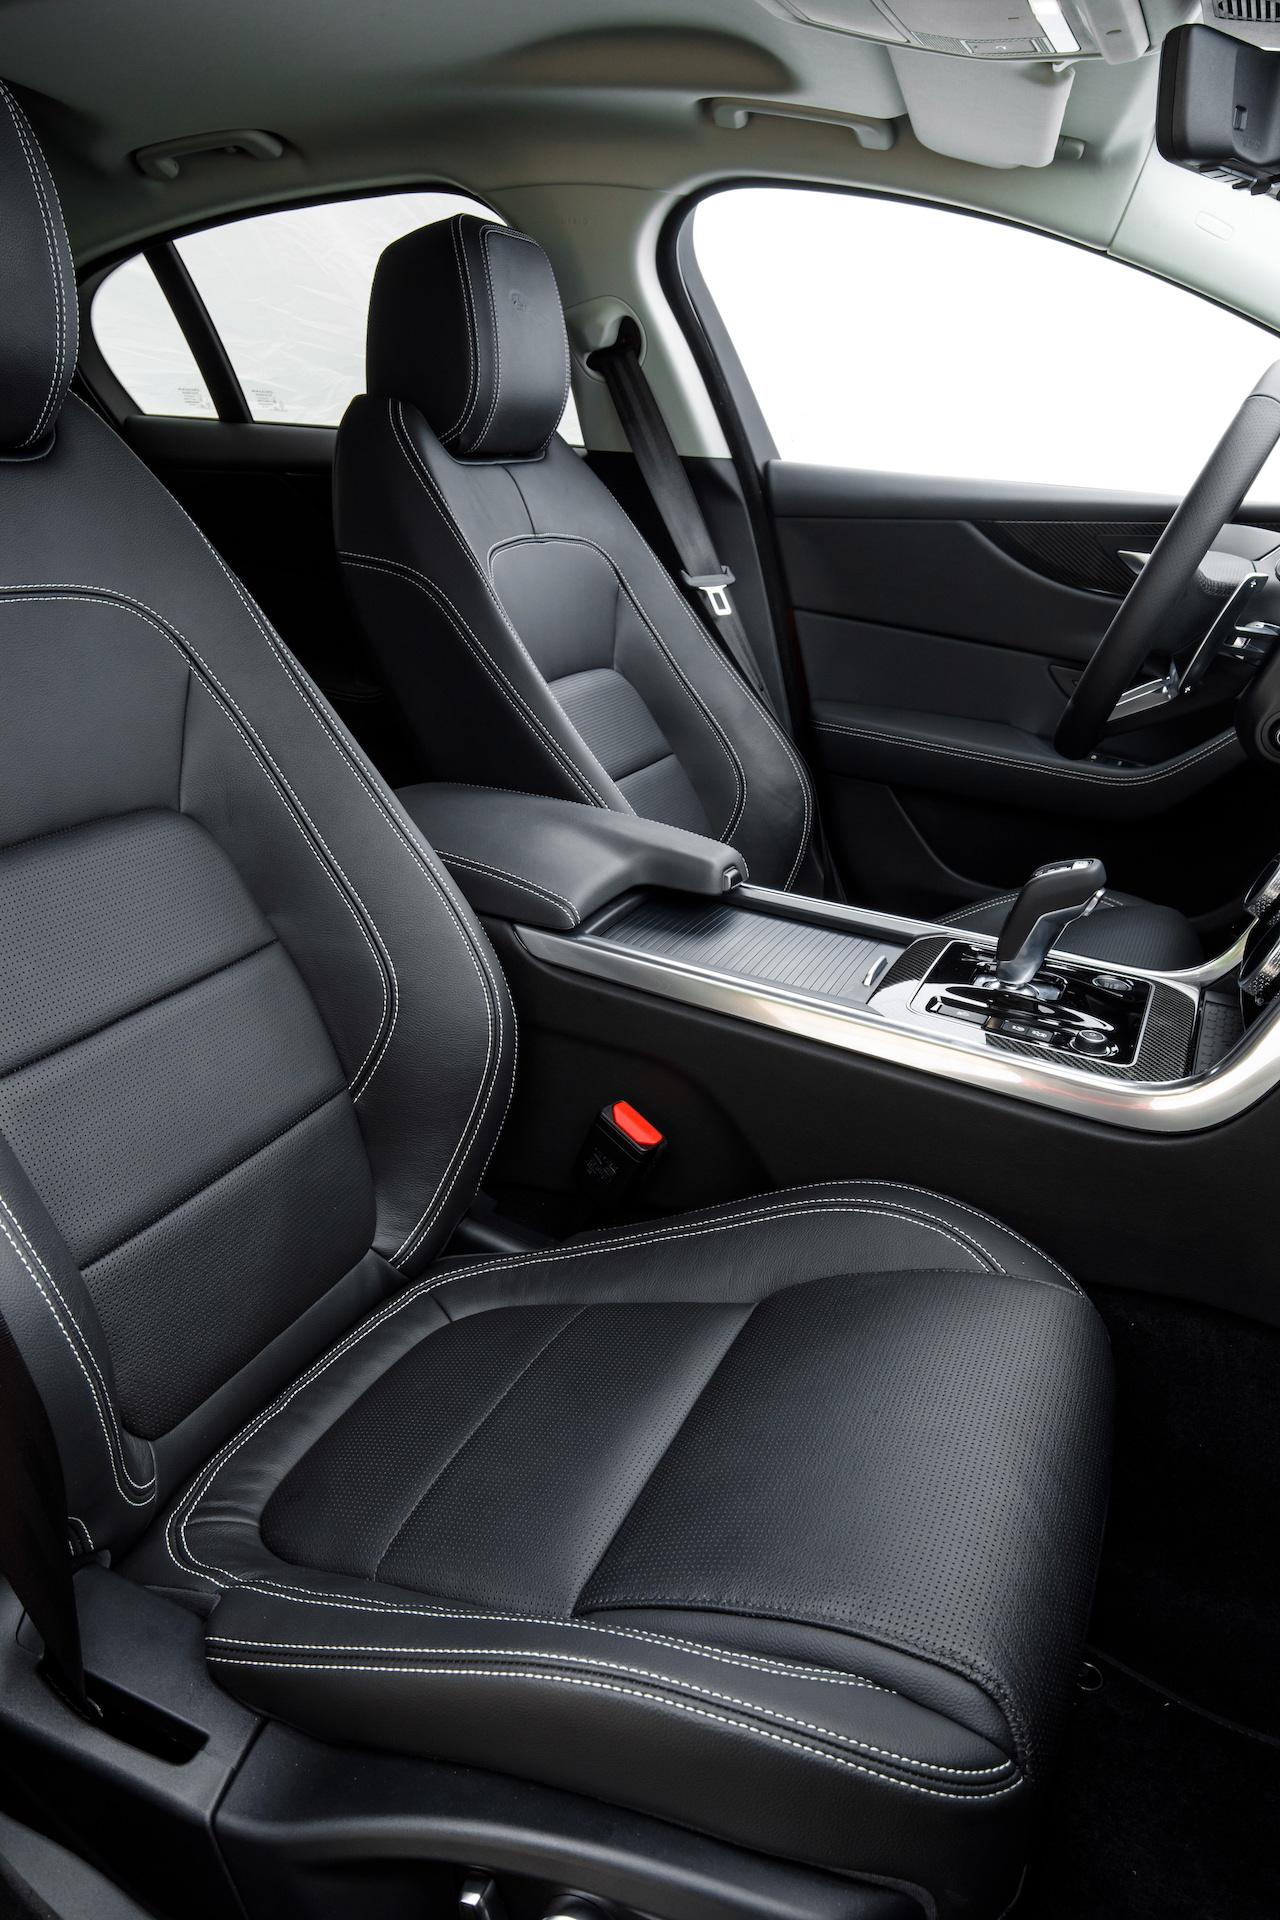 jaguar-xe-2020-3.JPG